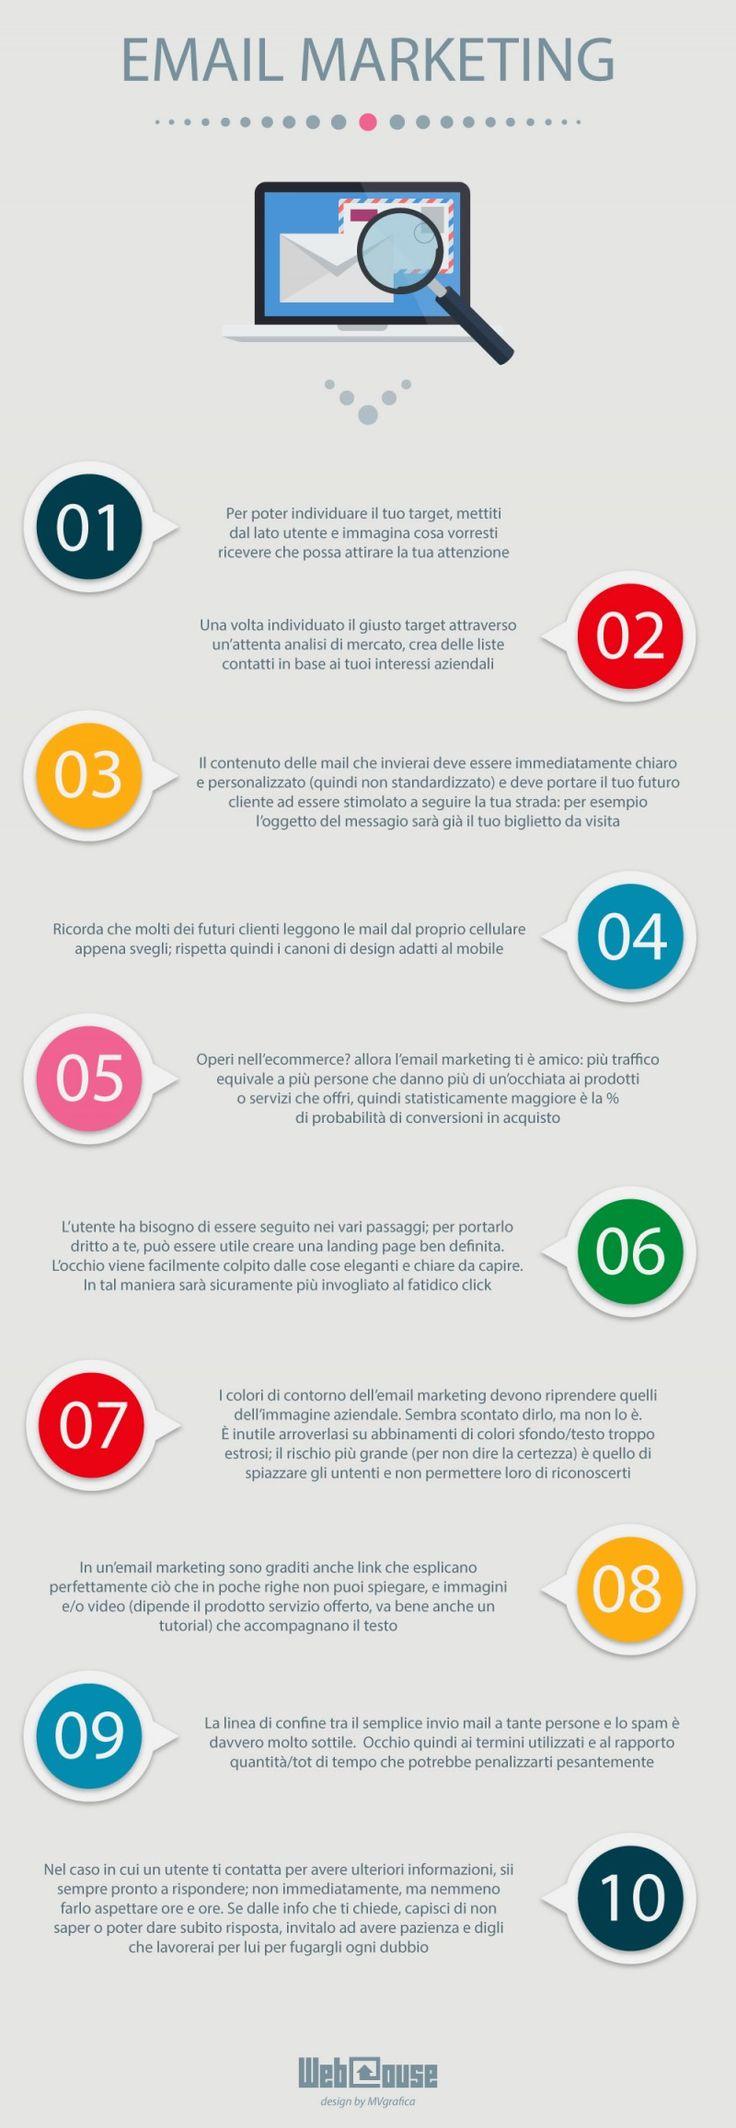 Email Marketing di successo in 10 mosse. #iobusiness